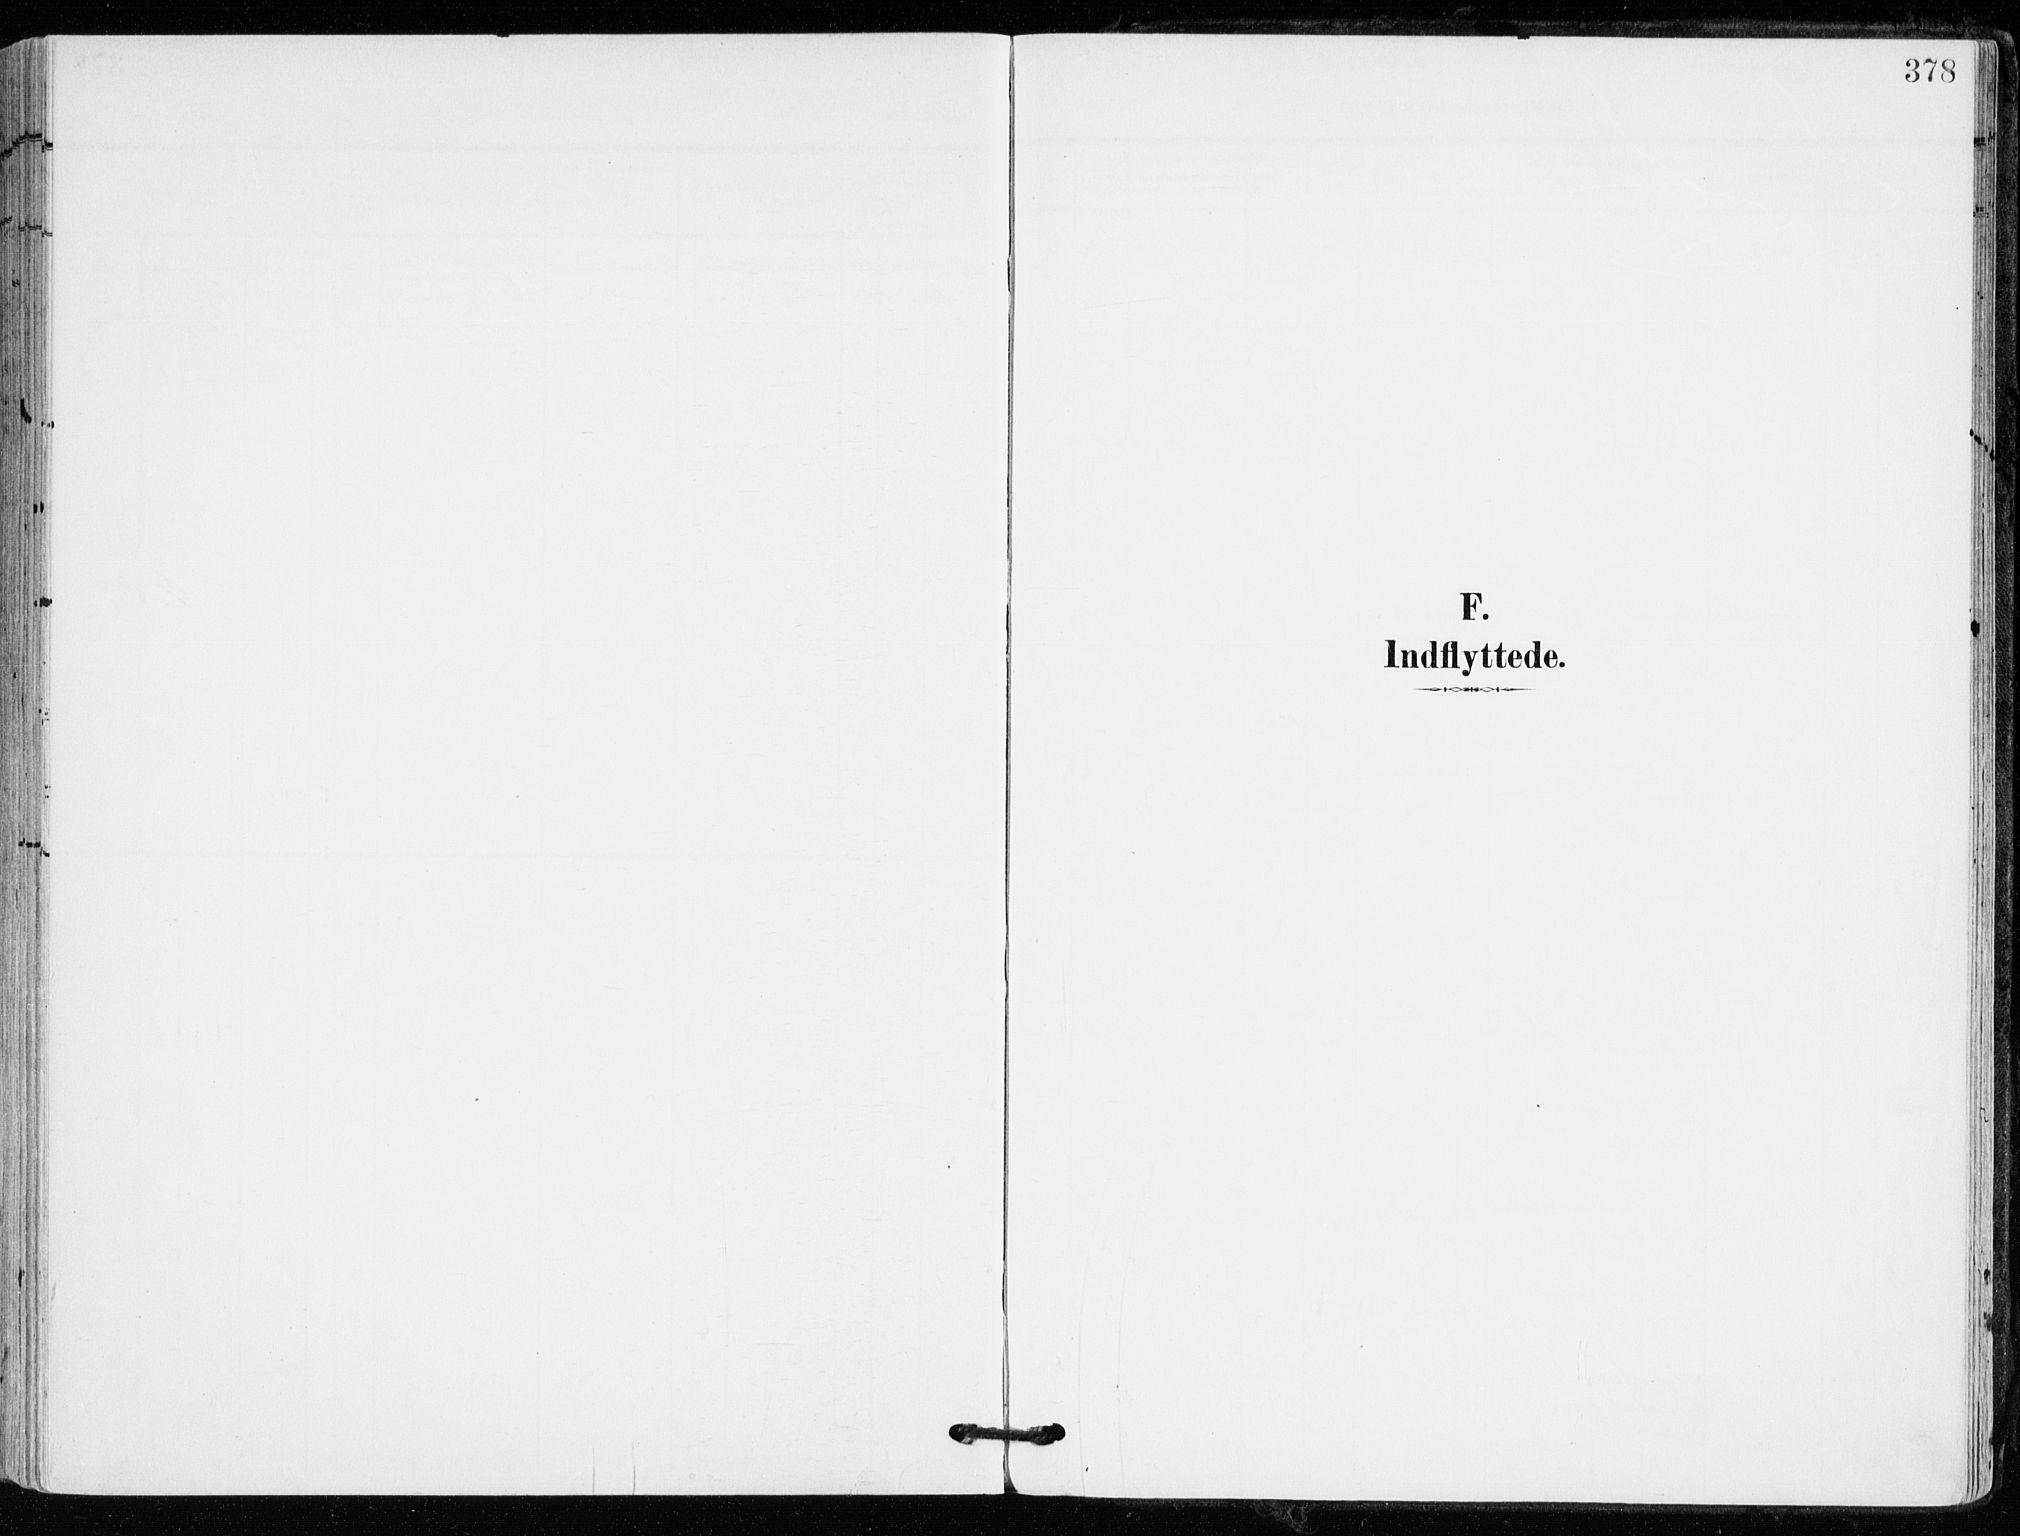 SAKO, Kongsberg kirkebøker, F/Fb/L0004: Ministerialbok nr. II 4, 1906-1918, s. 378